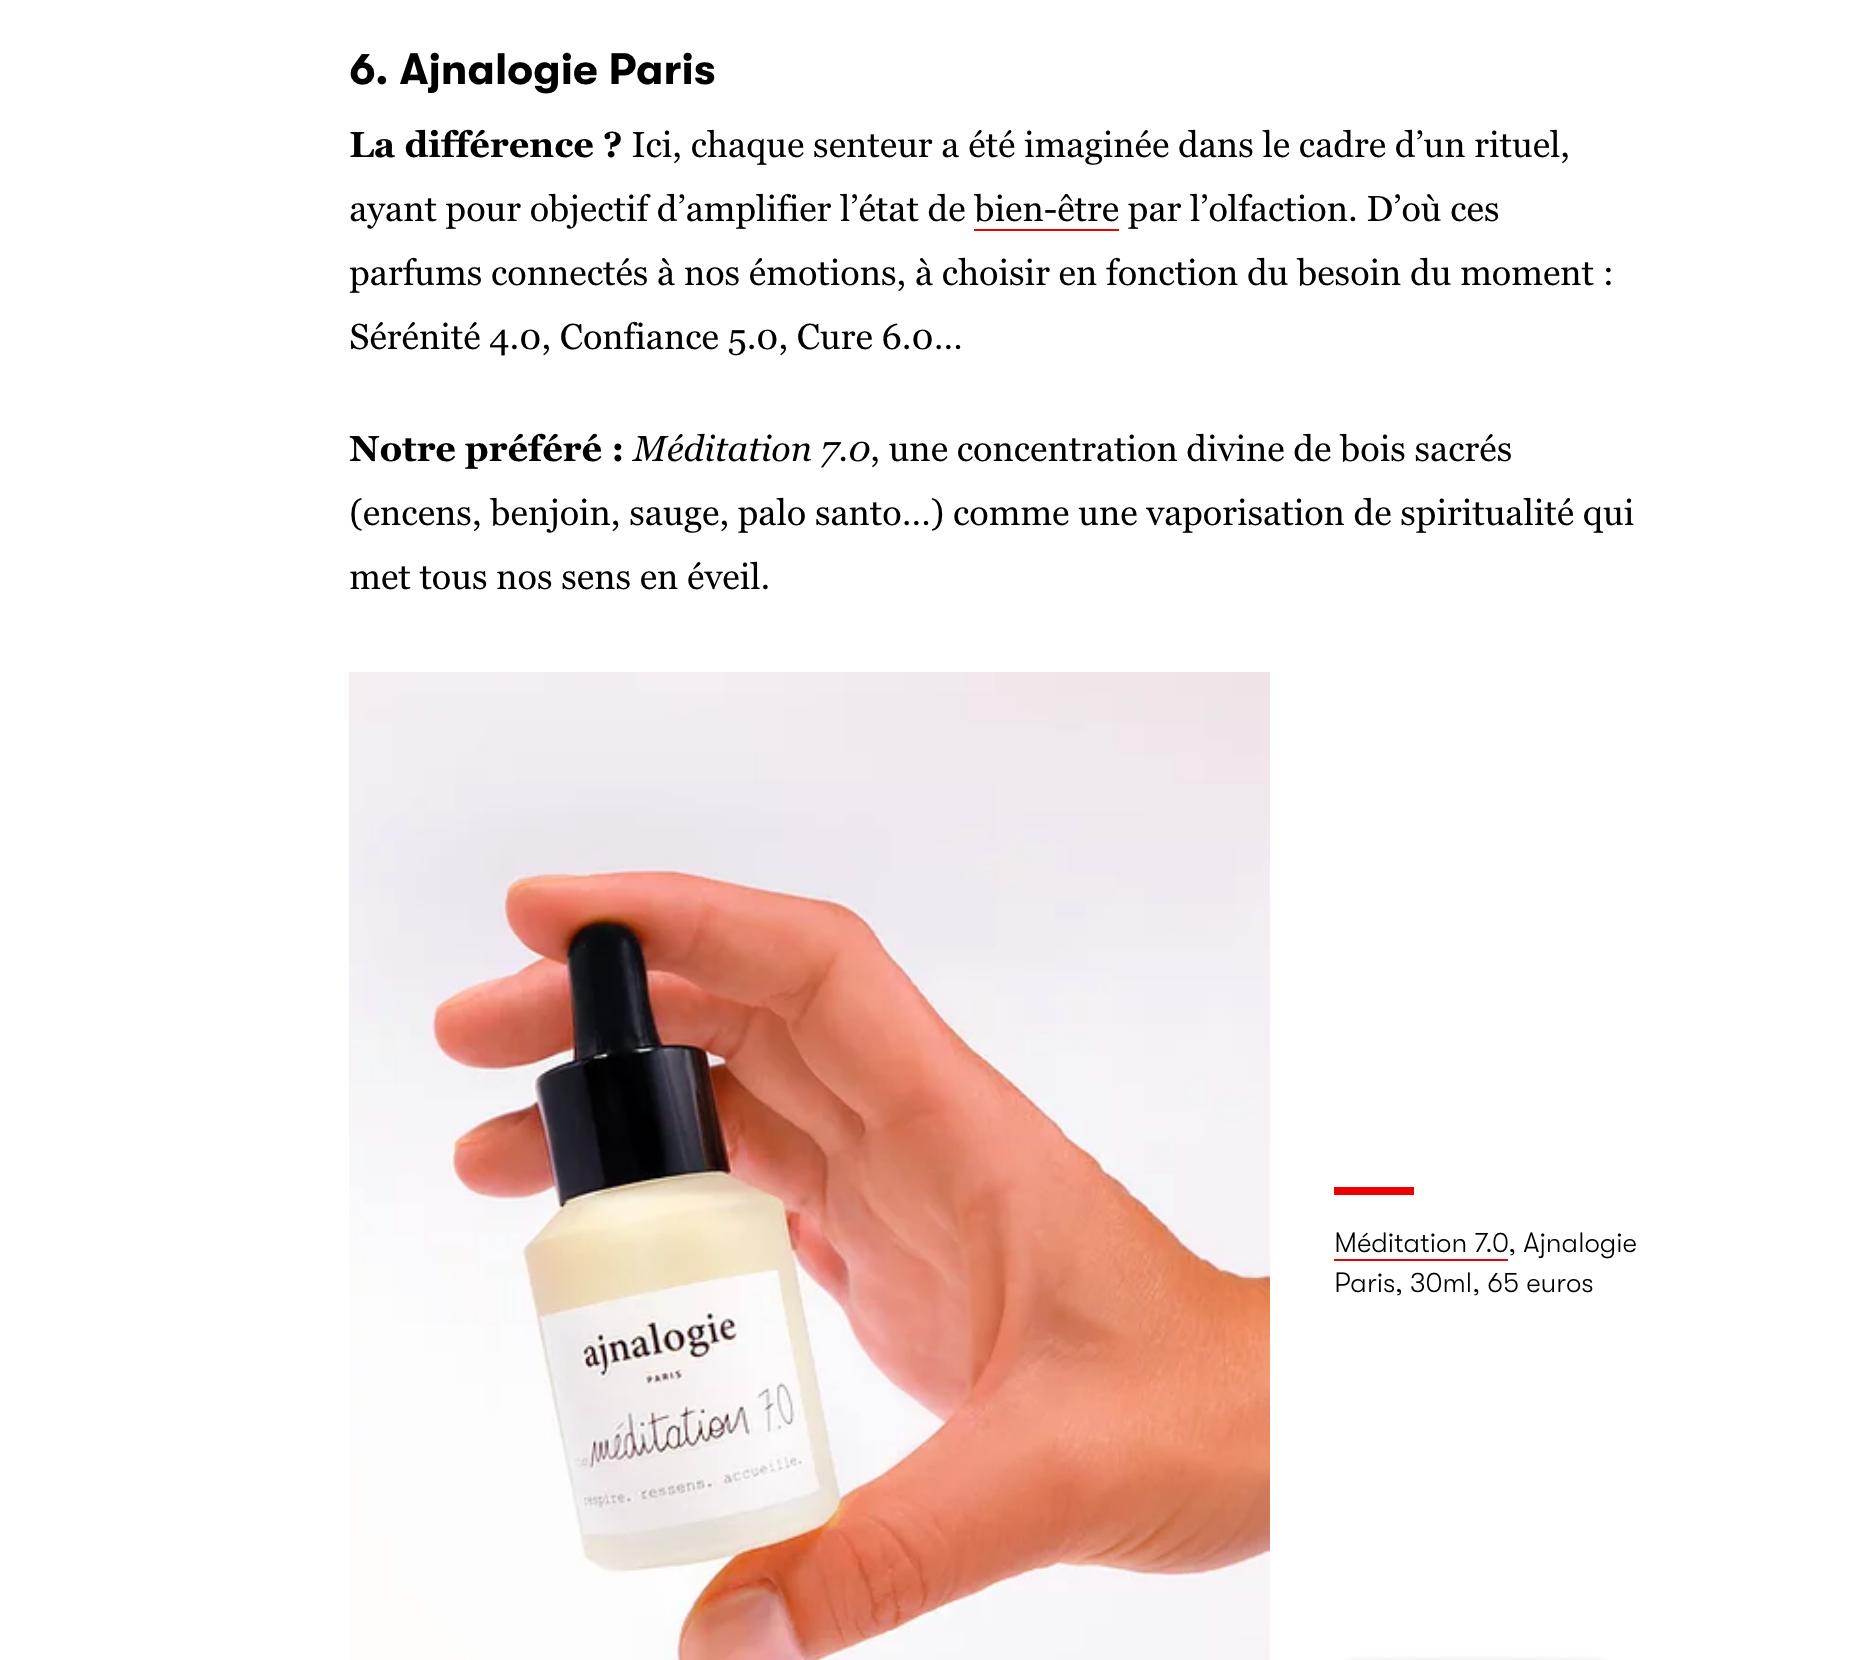 vogue-ajnalogie_parfums_naturels